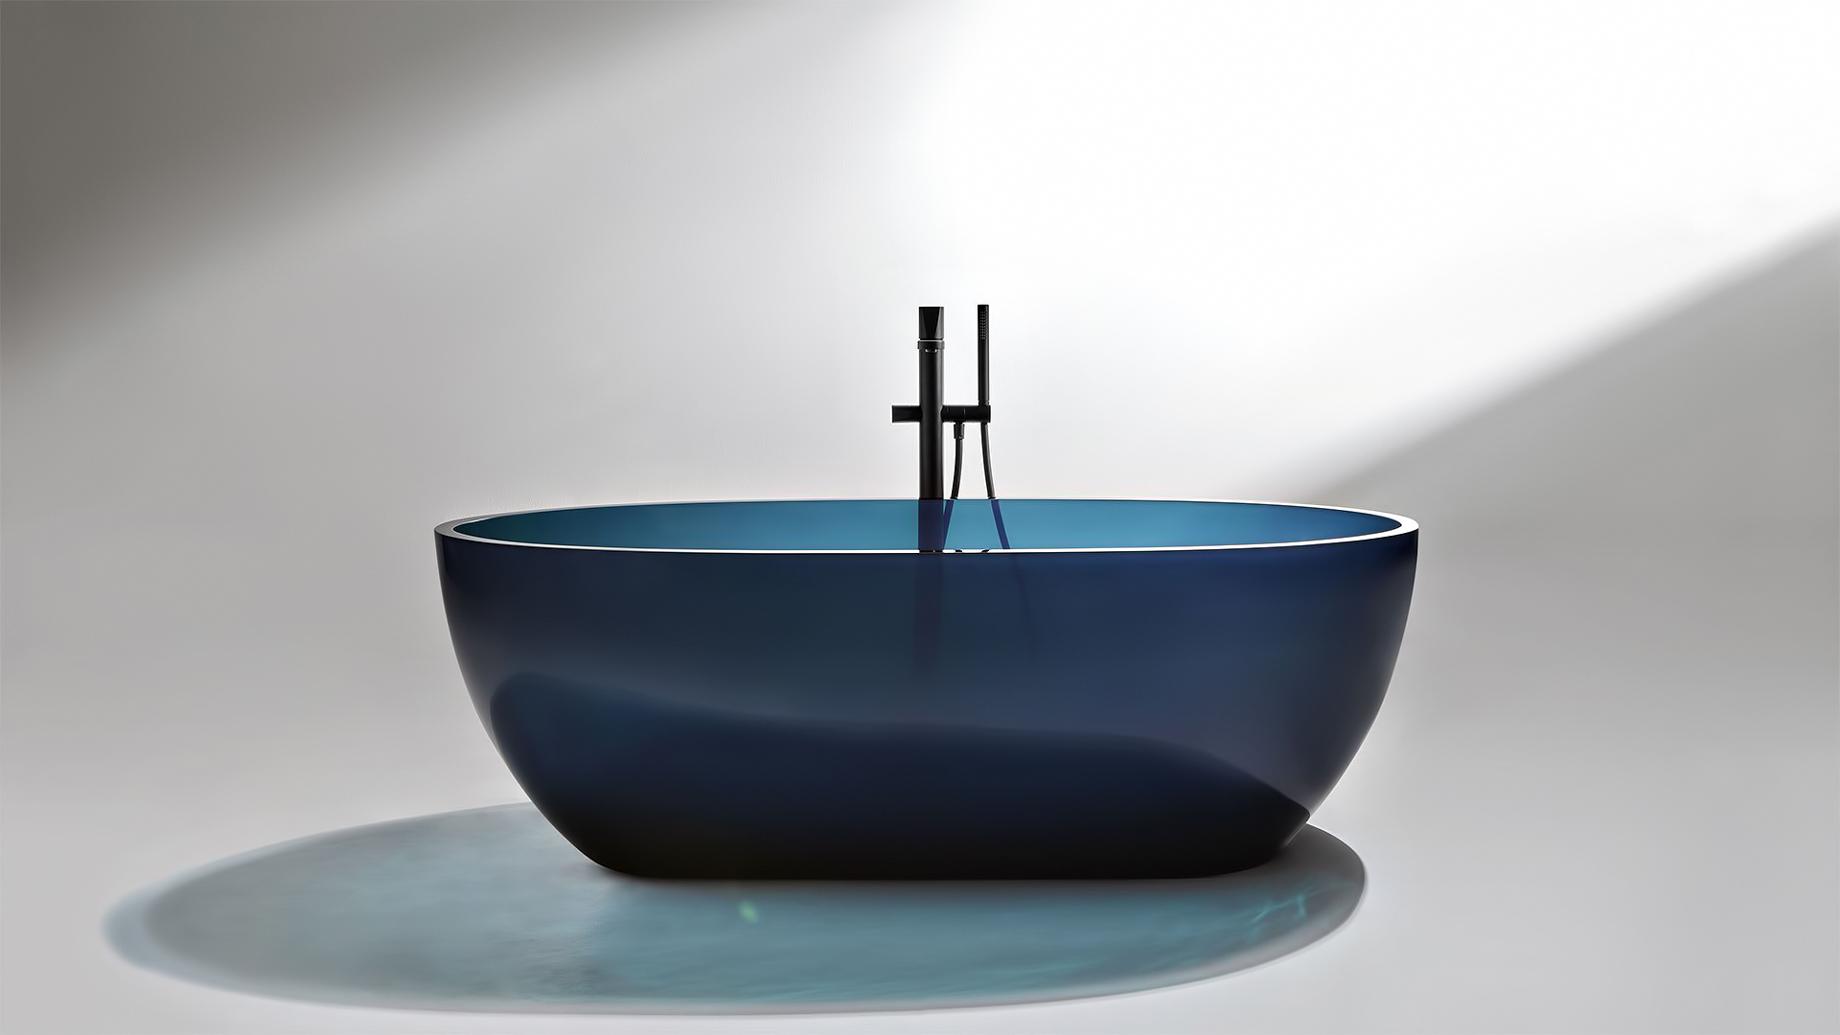 Transparent REFLEX Cristalmood Resin Luxury Bathtub by AL Studio – Ceruleo